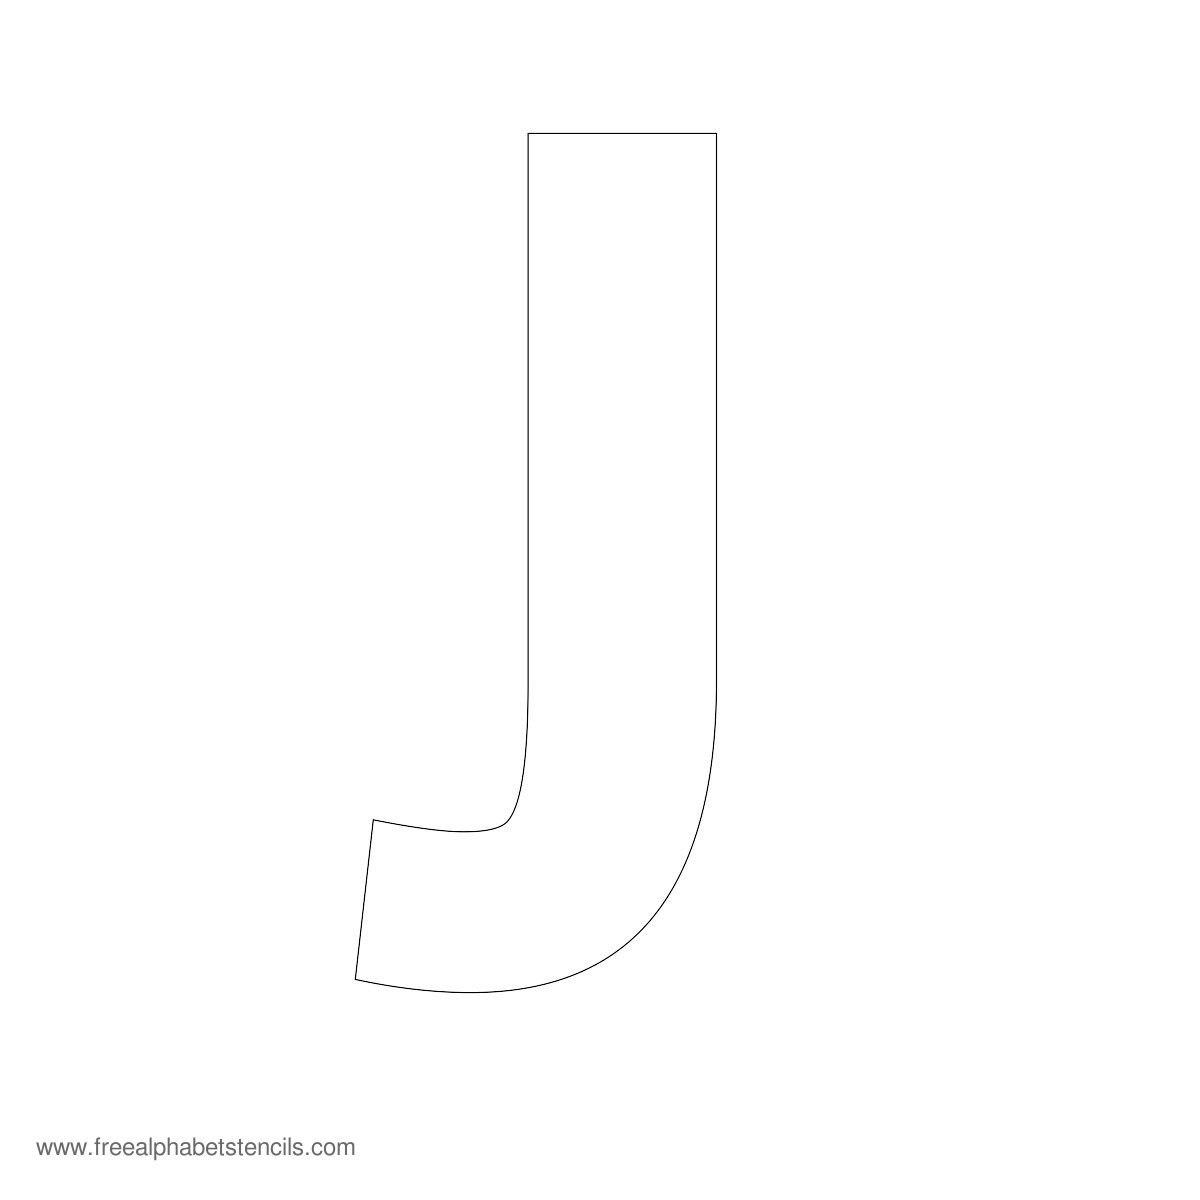 Large Alphabet Stencils  Freealphabetstencils Inside Large Letter Templates